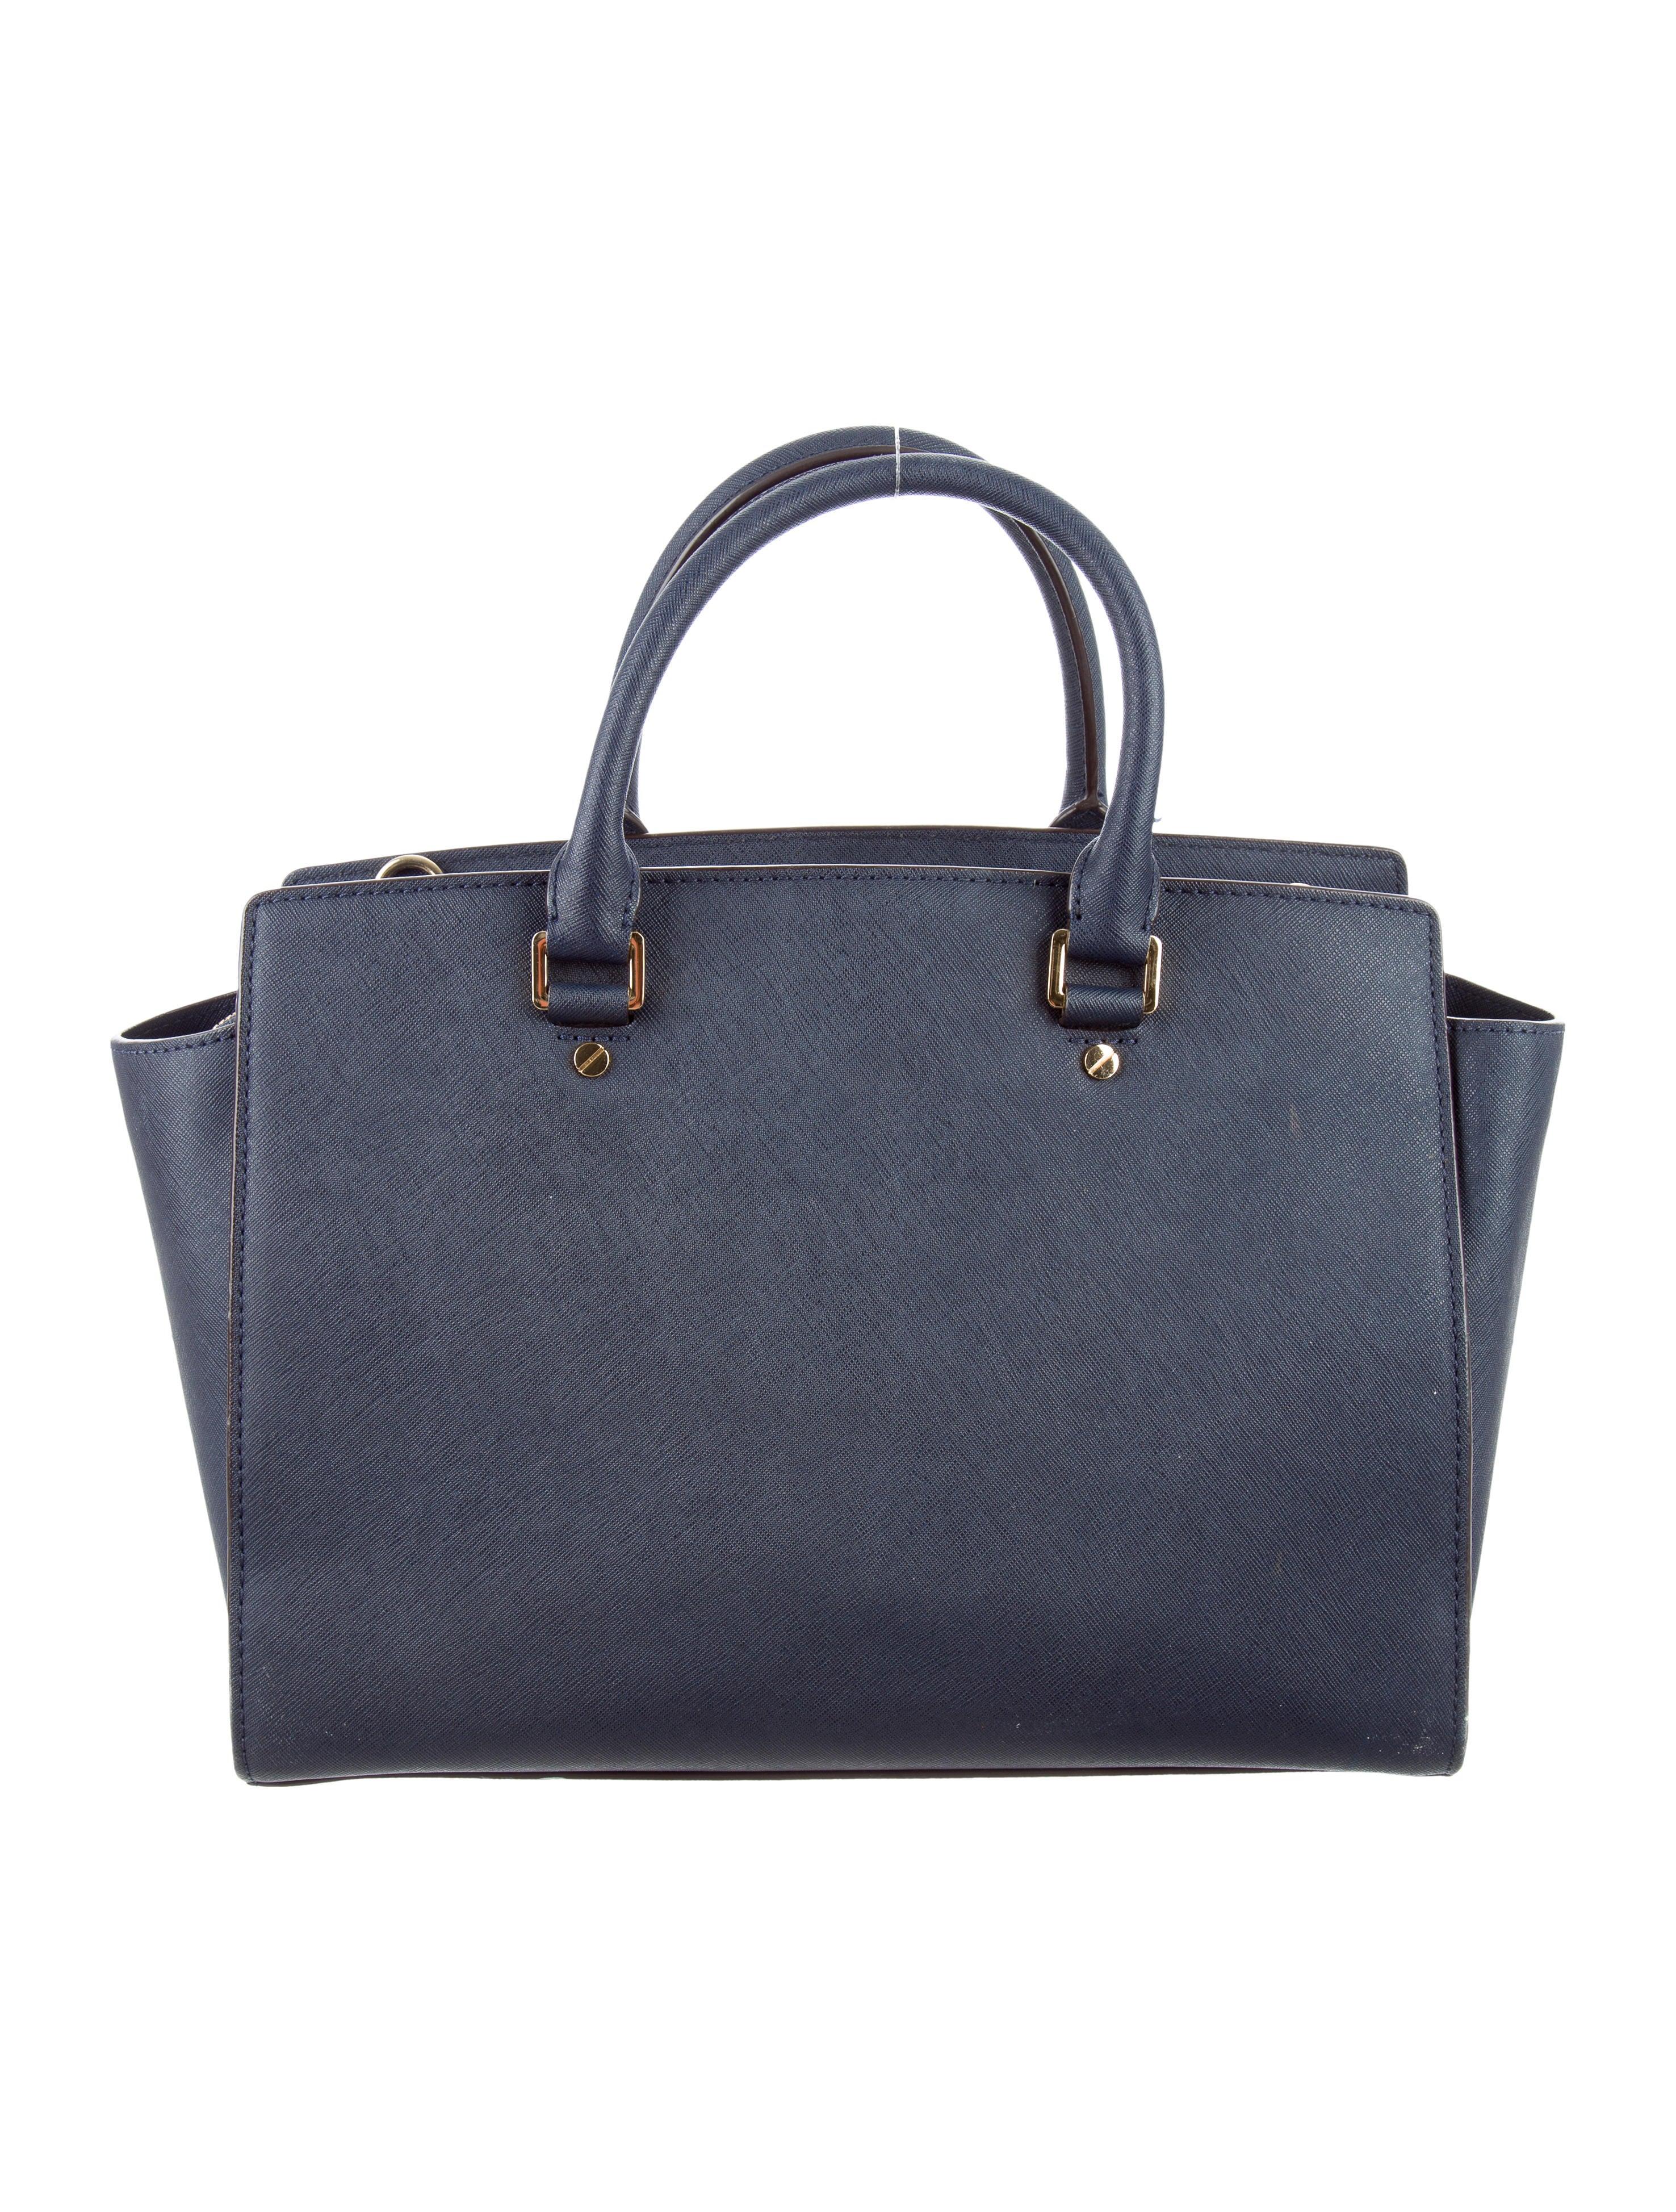 michael michael kors large selma bag handbags wm521062. Black Bedroom Furniture Sets. Home Design Ideas